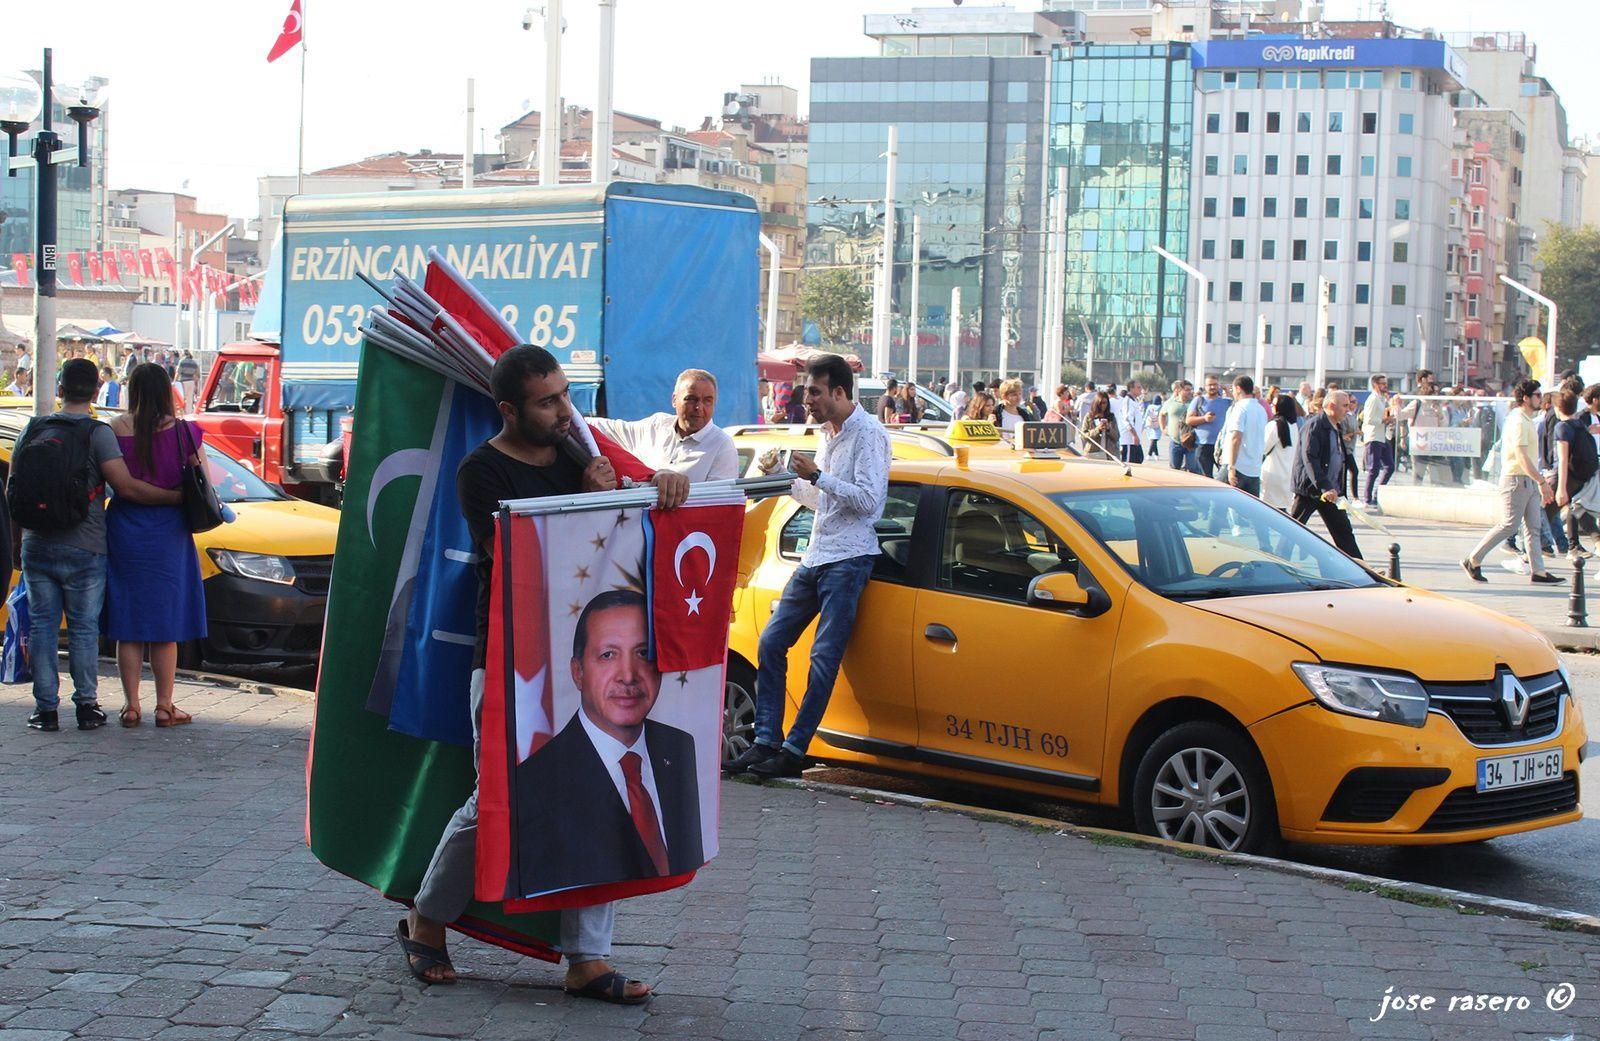 'Taksim meydani'